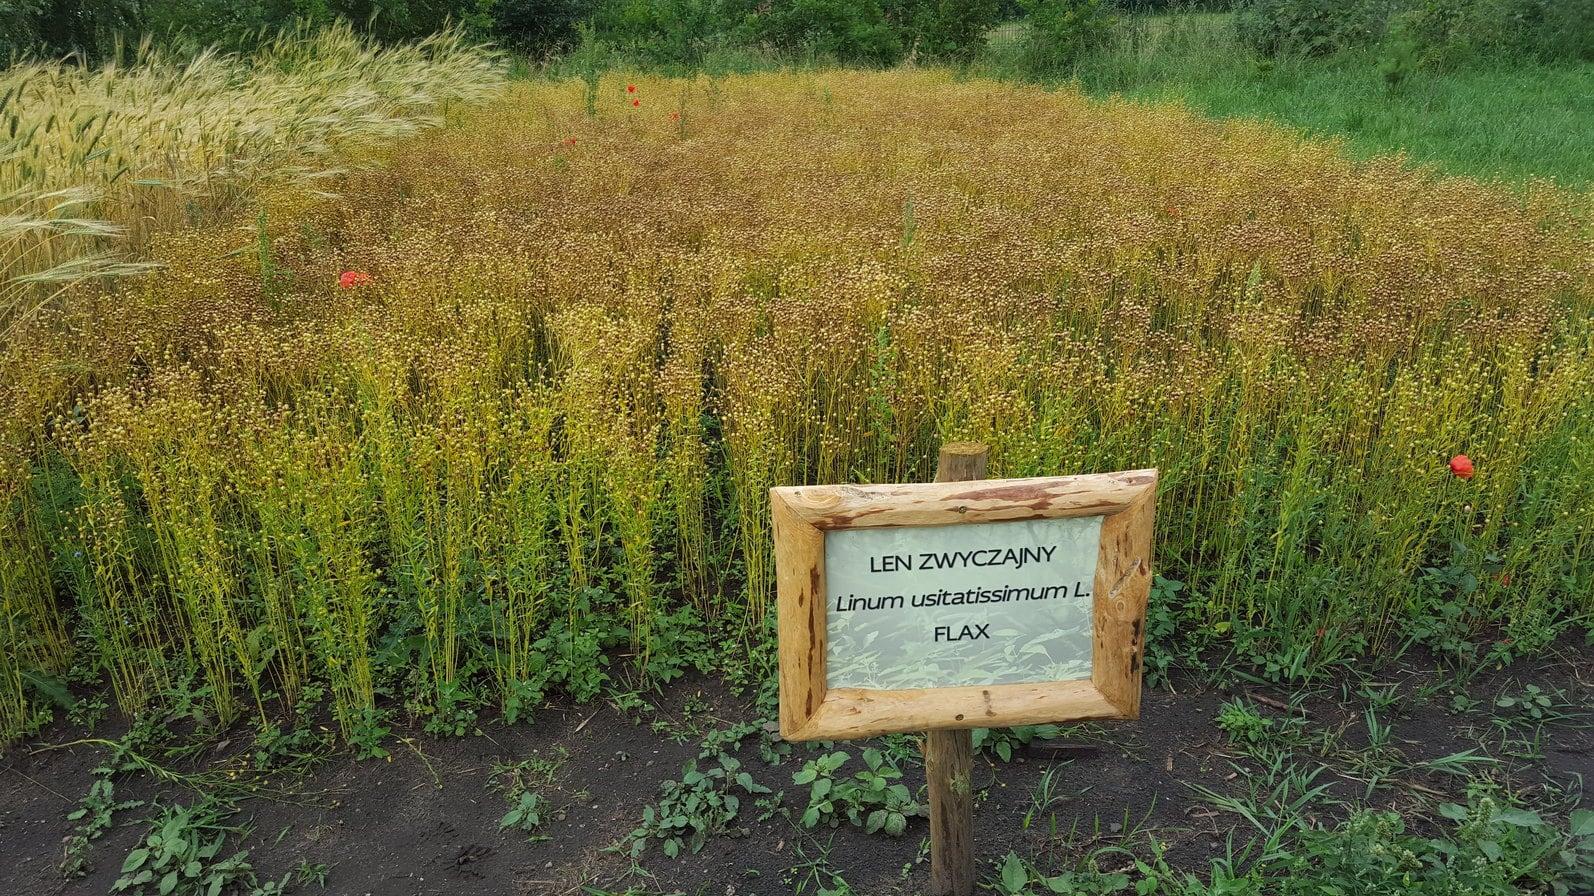 Flax became the main material for Ekoa